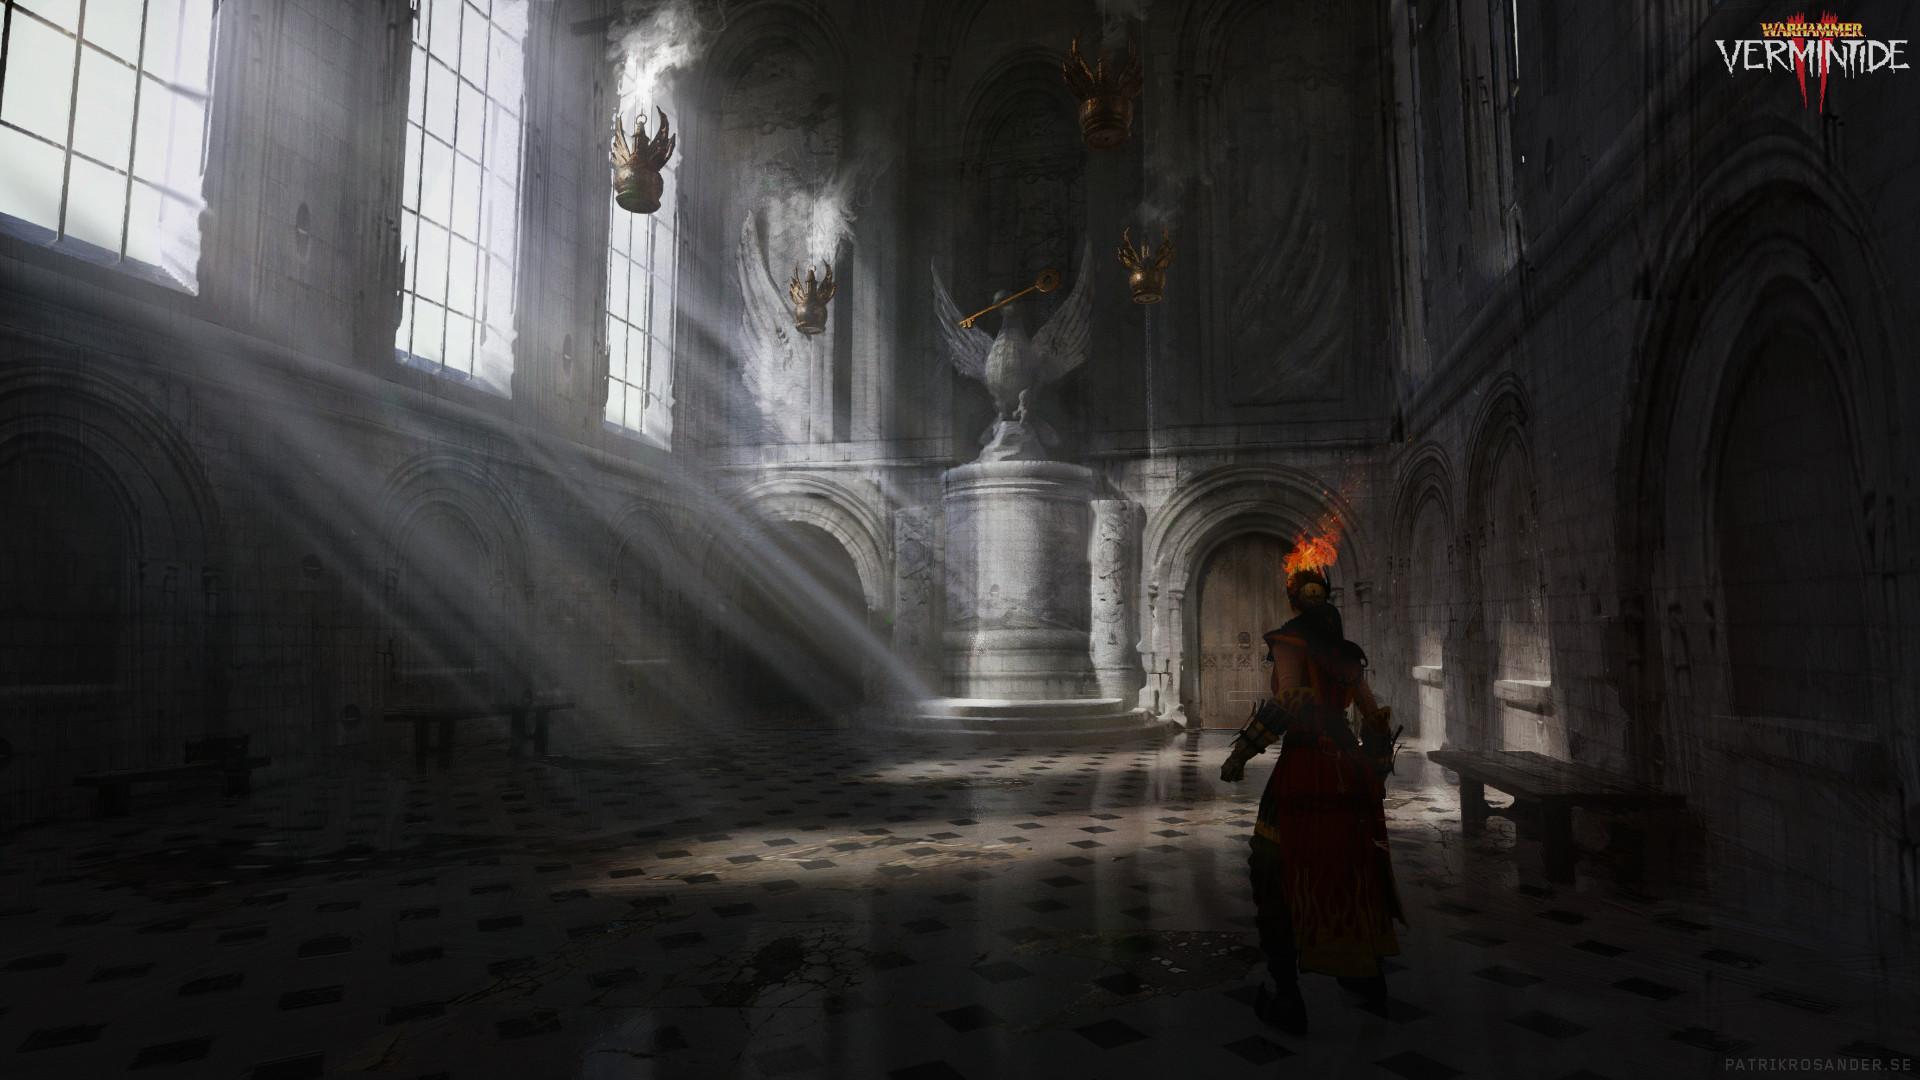 Patrik rosander convocation of decay shallya entrance